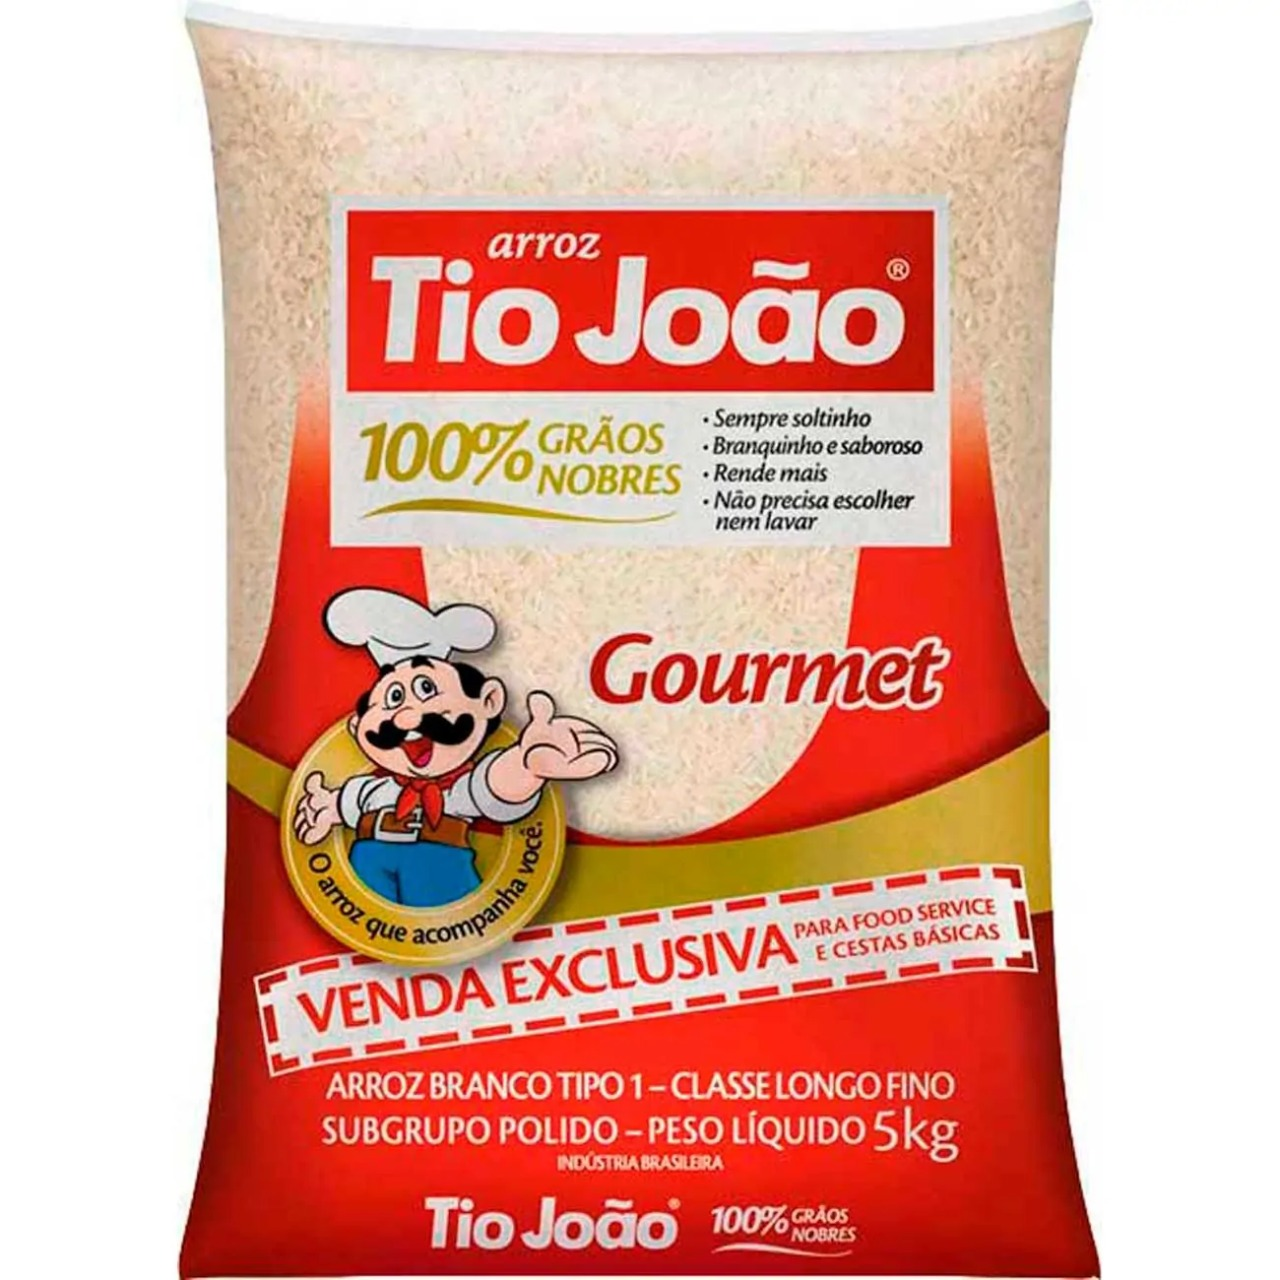 arroz Tio João gourmet branco 6x5 kg